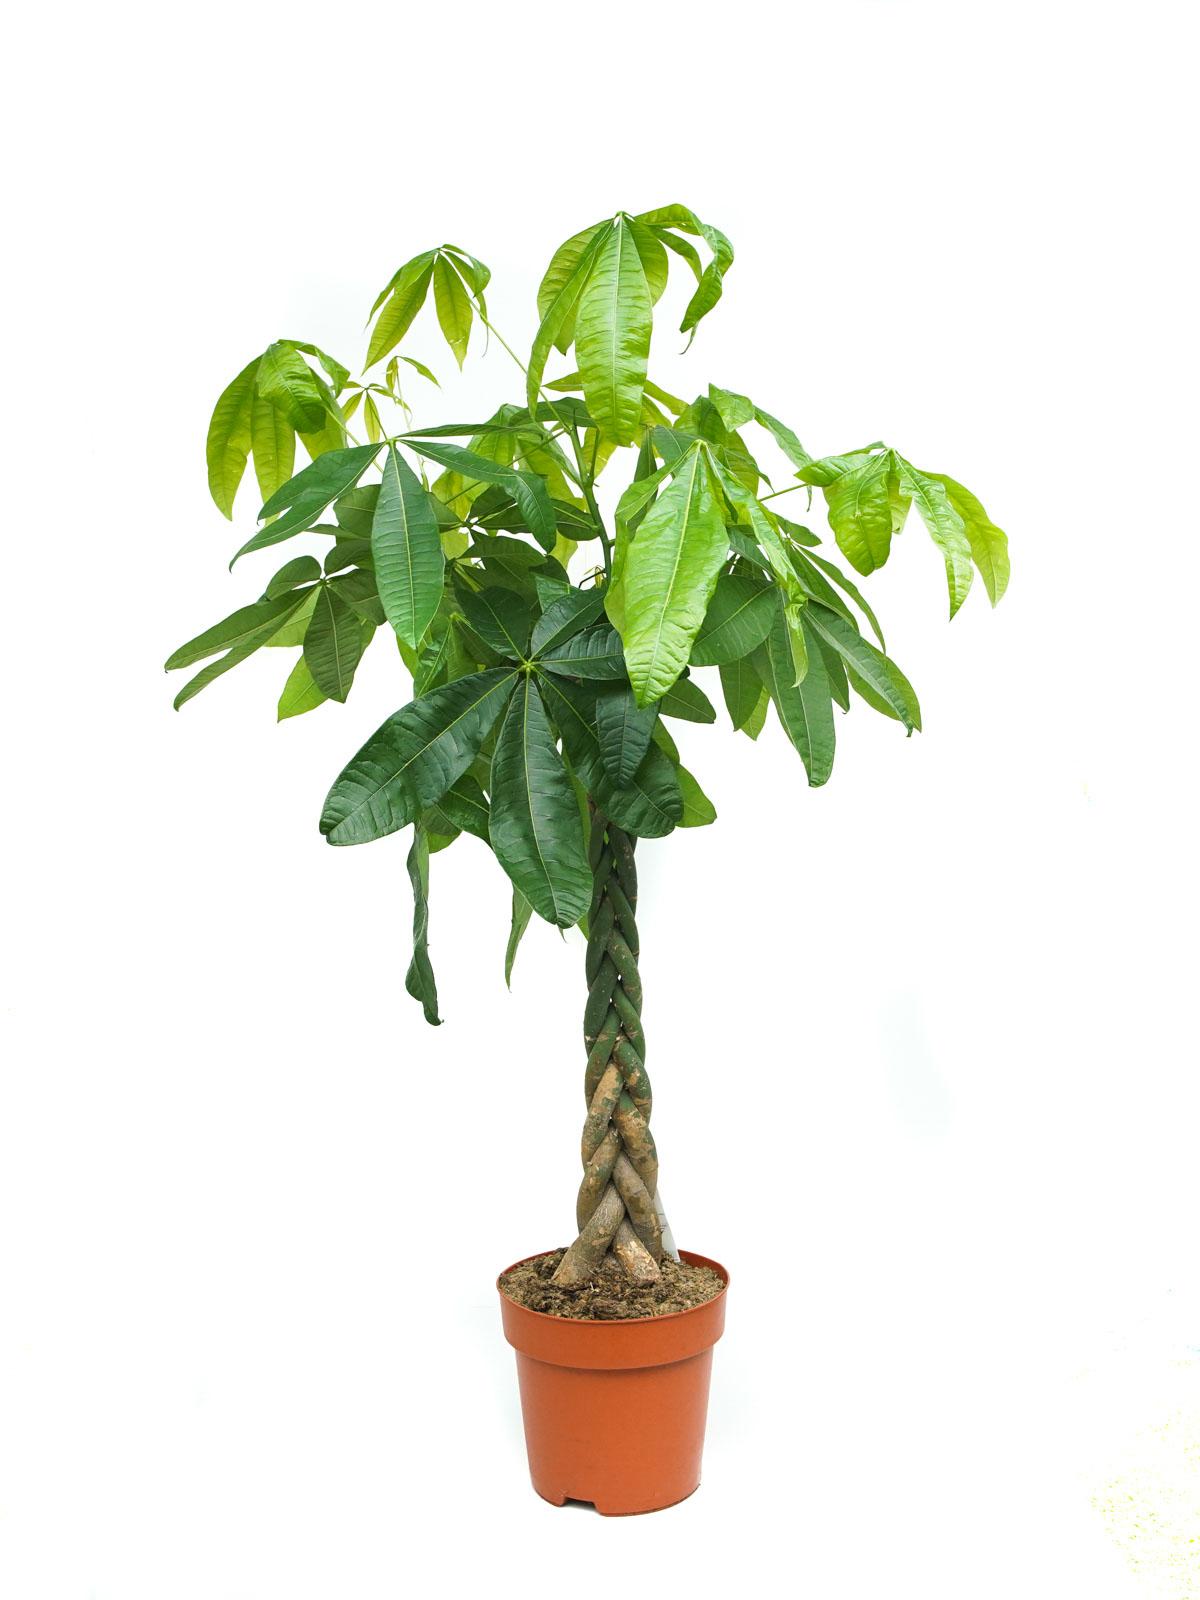 Pachira Braided Holland 'Indoor Plants'